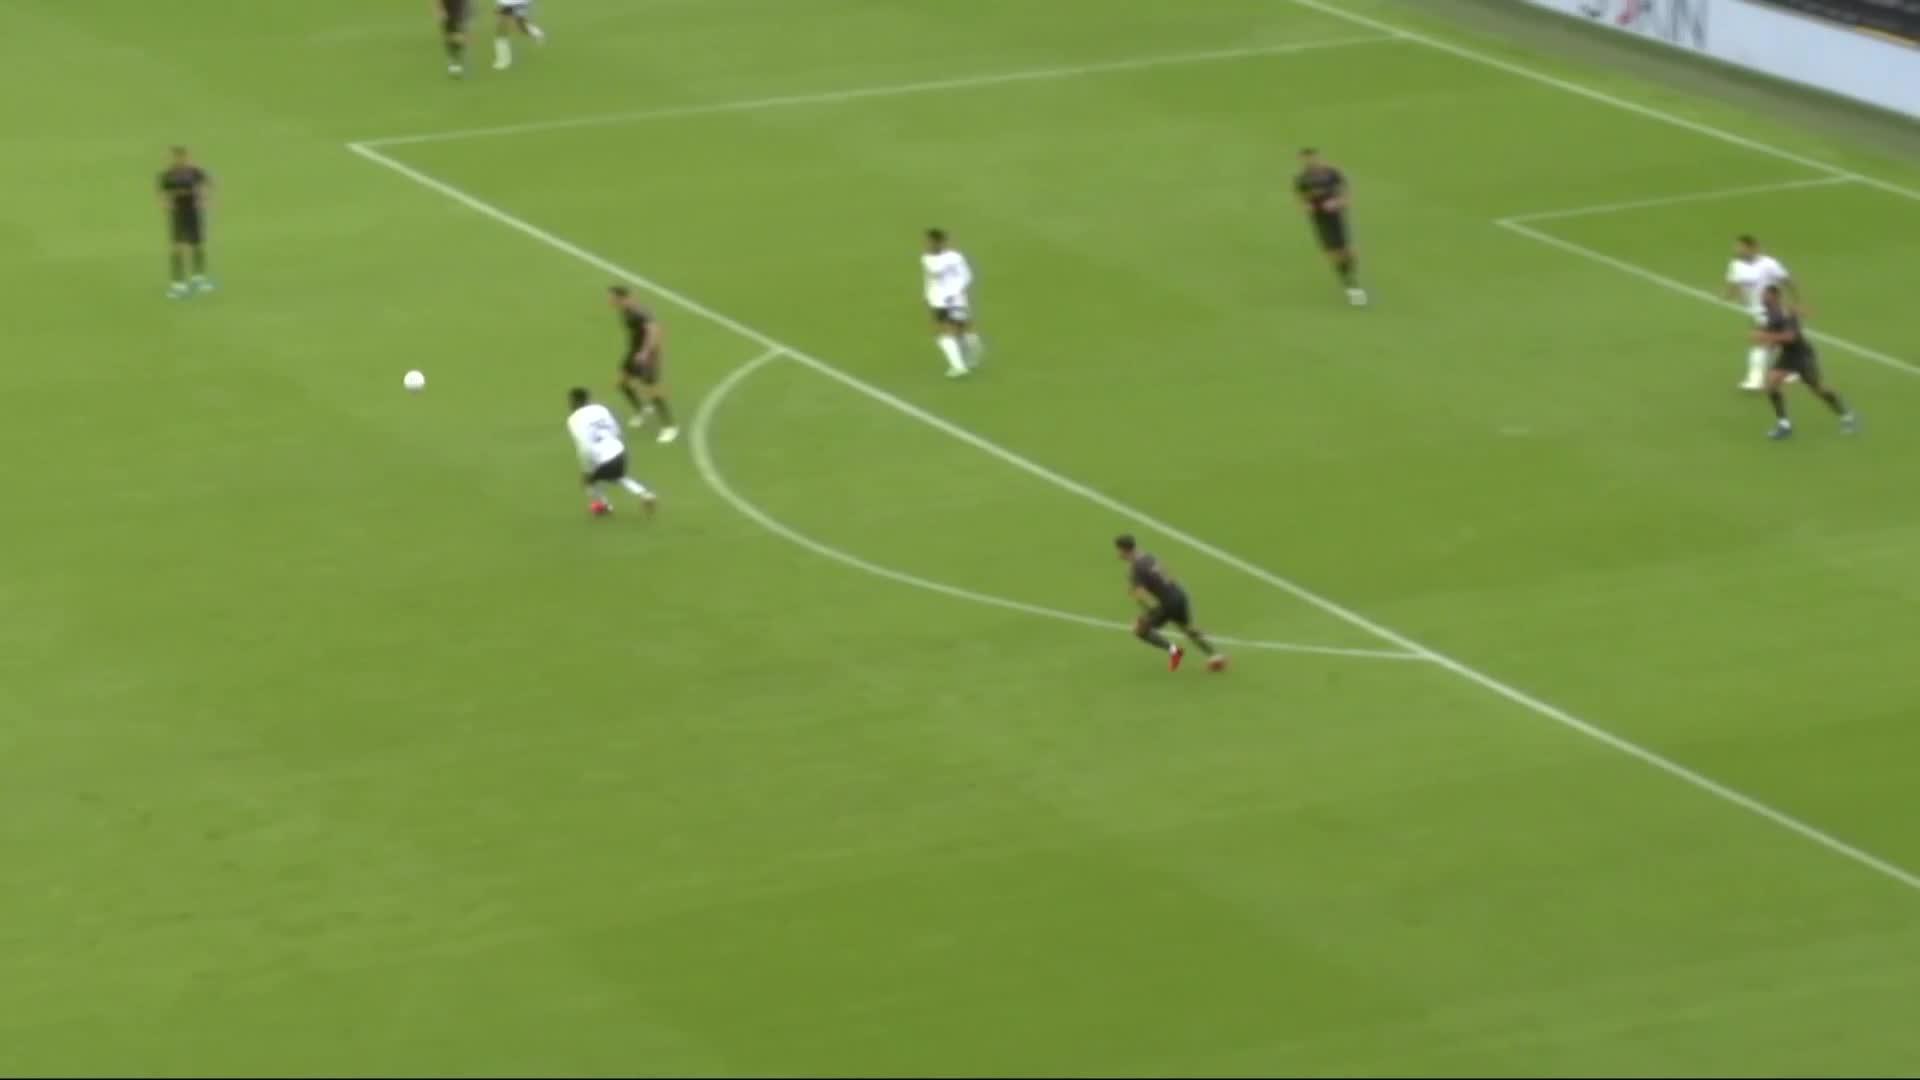 PRE SEASON HIGHLIGHTS | Fulham 1 Charlton 0 (July 2021)